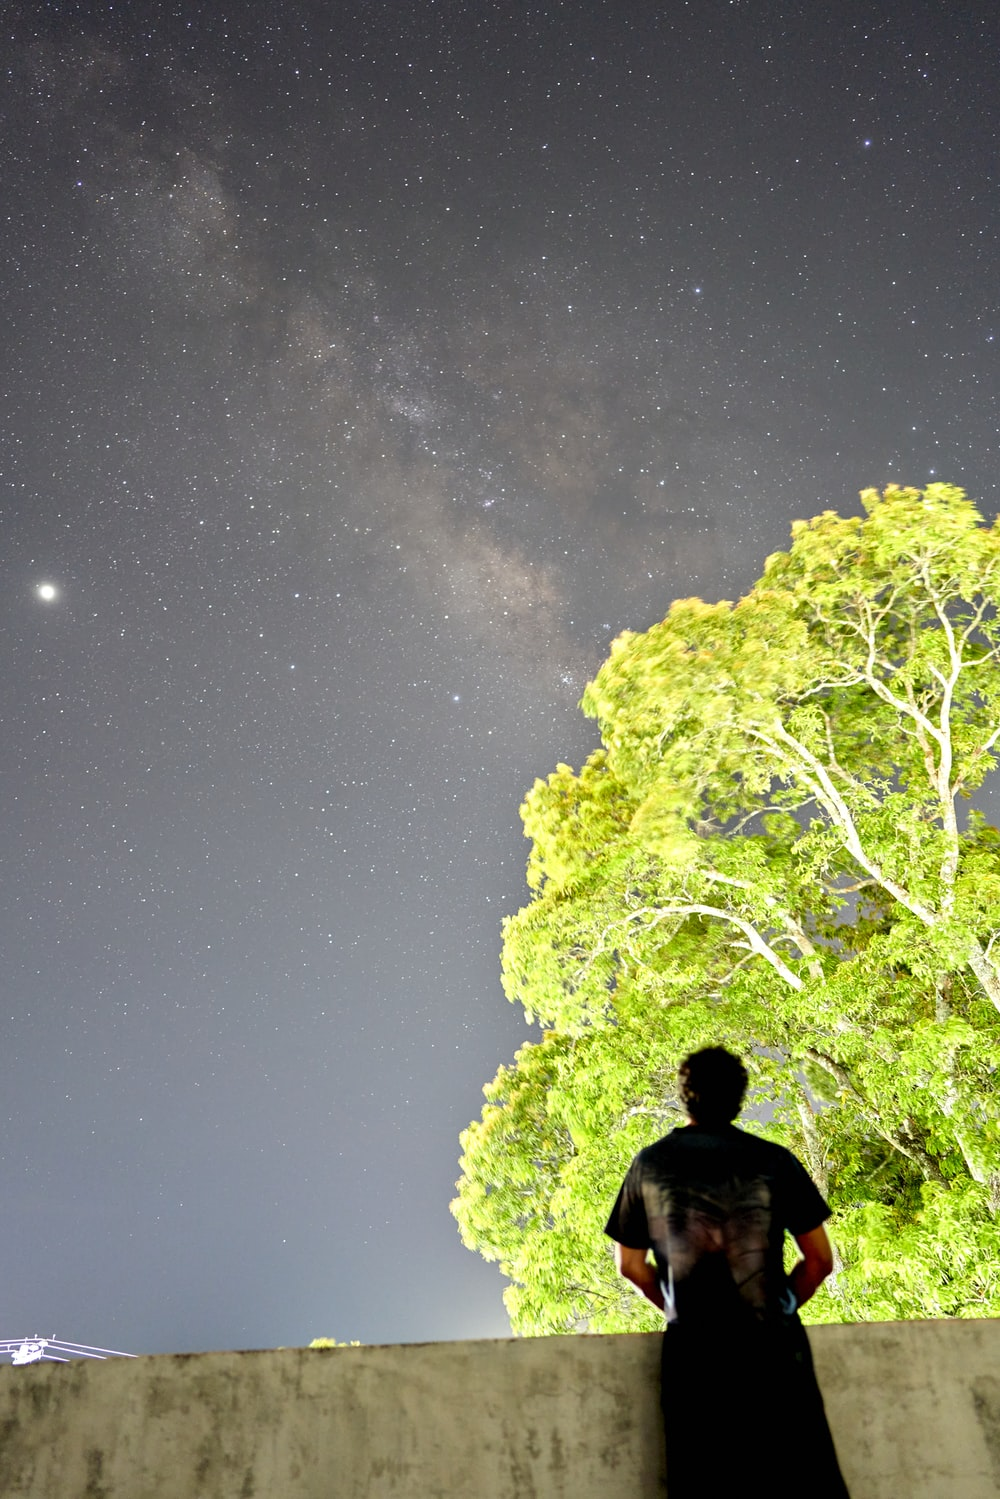 man in black jacket standing near green tree under starry night